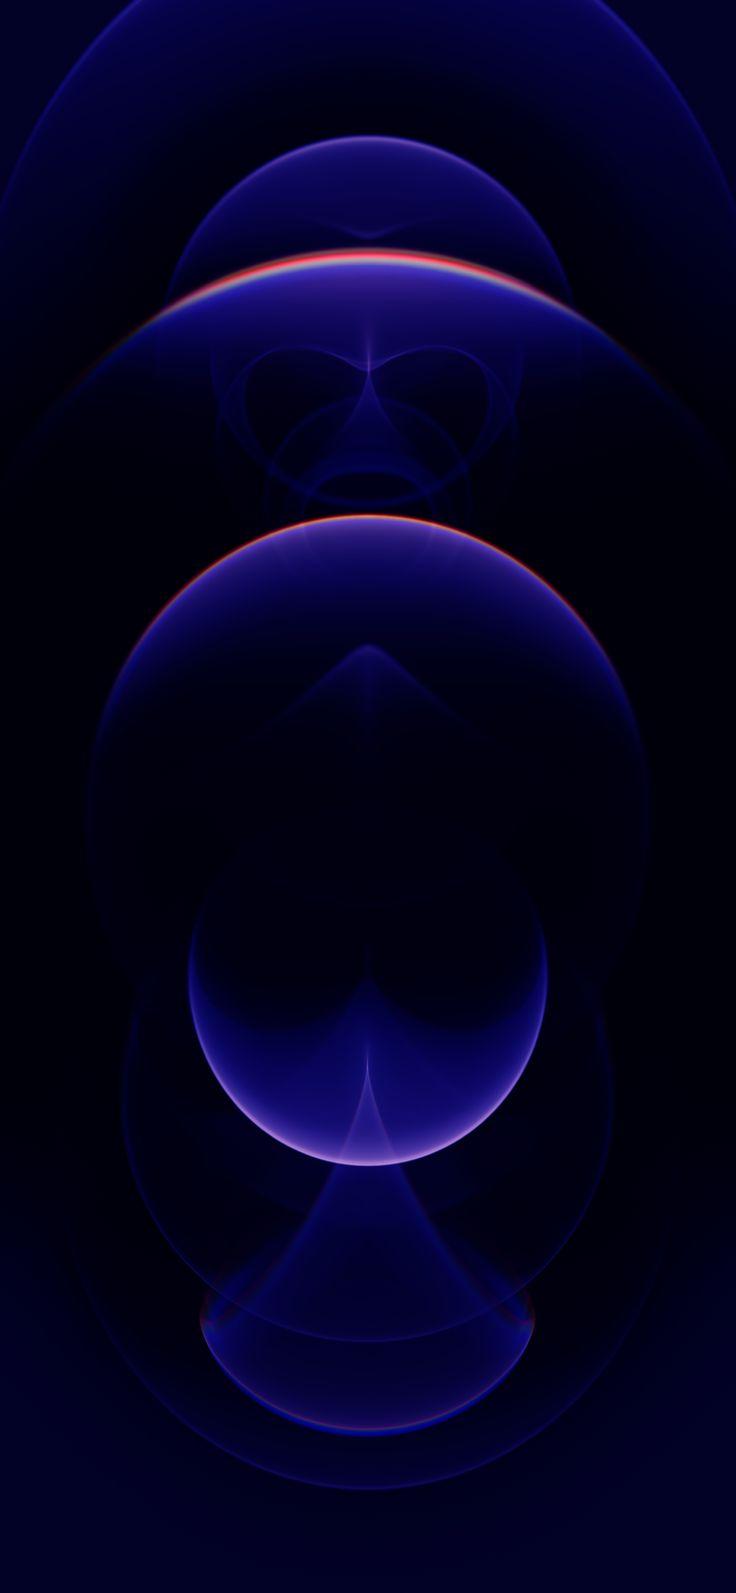 iPhone 21 Pro Max Wallpaper   Iphone lockscreen wallpaper, Purple ...